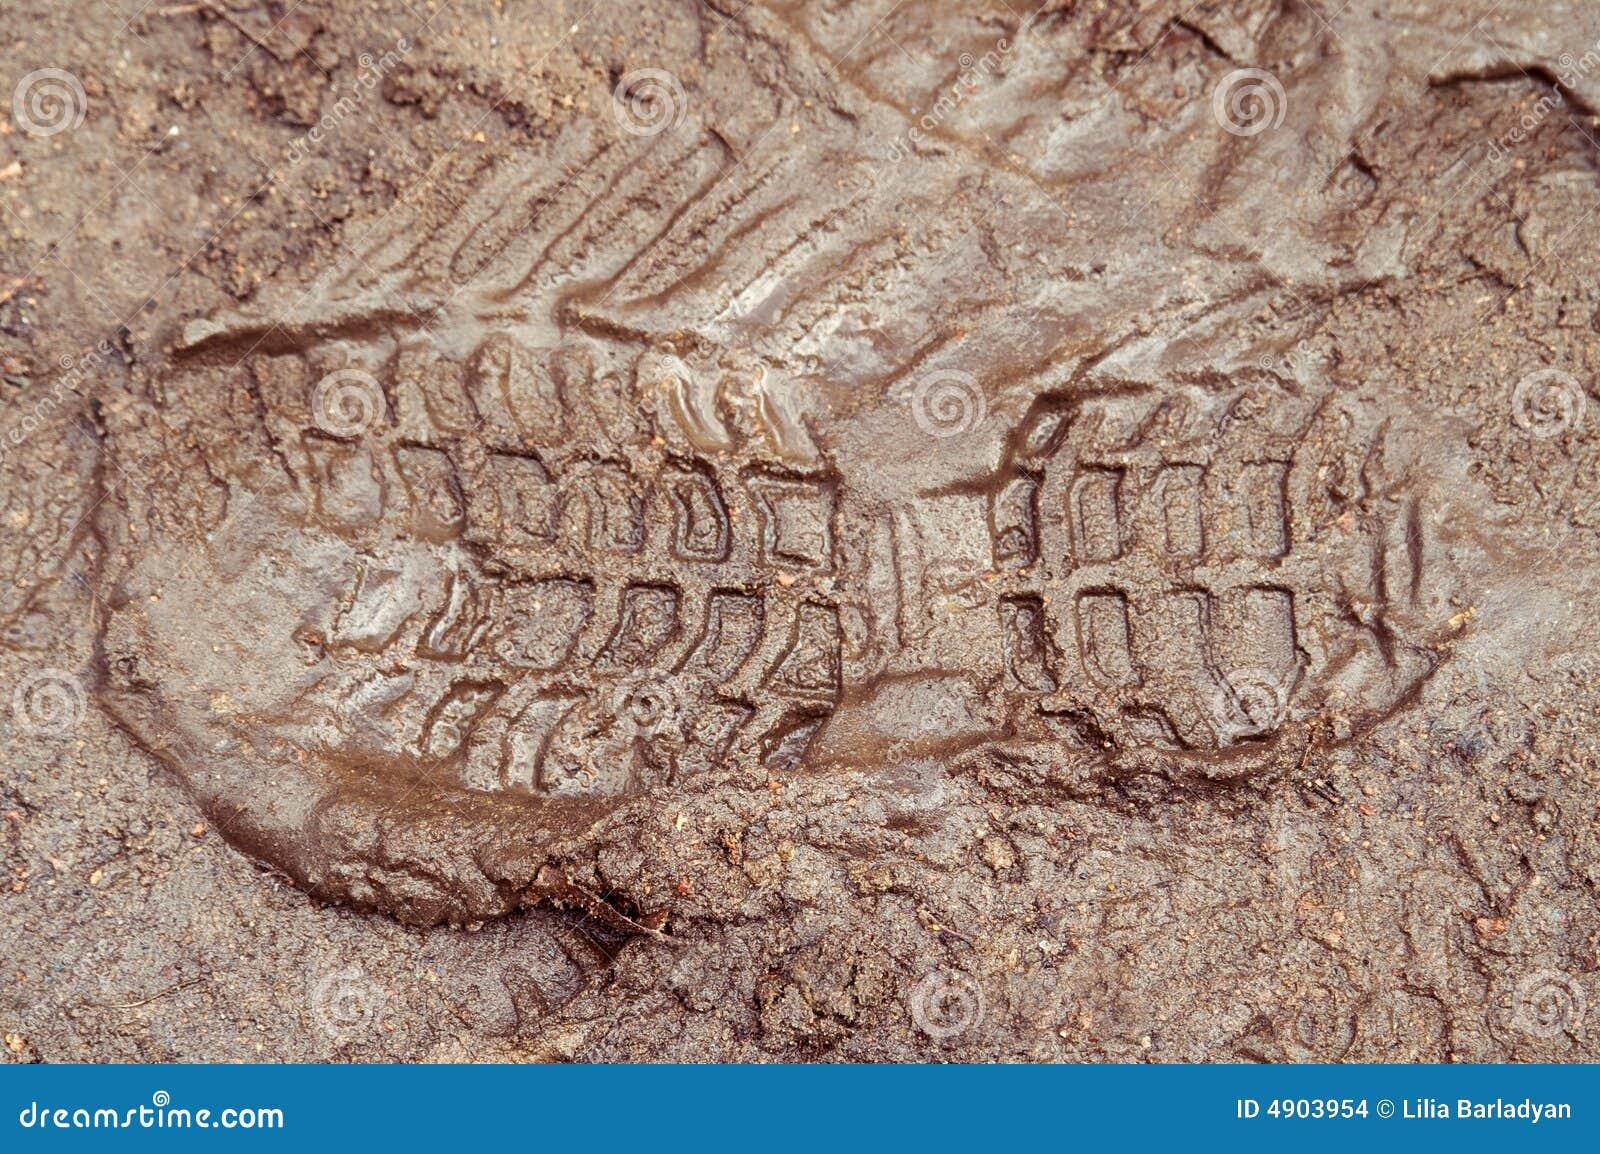 Boot print in brown mud